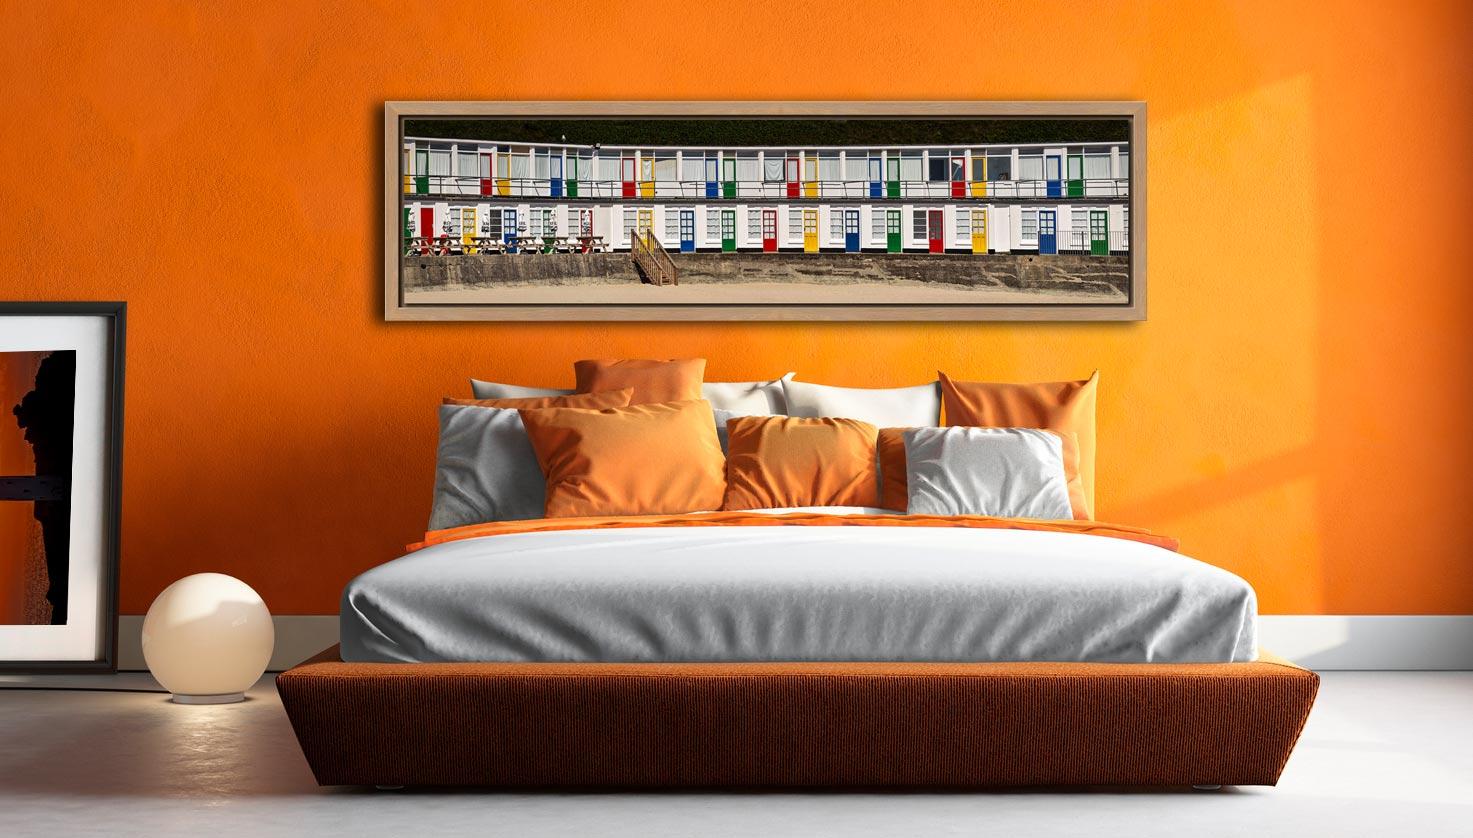 Porthgwidden Beach Chalets - Oak floater frame with acrylic glazing on Wall